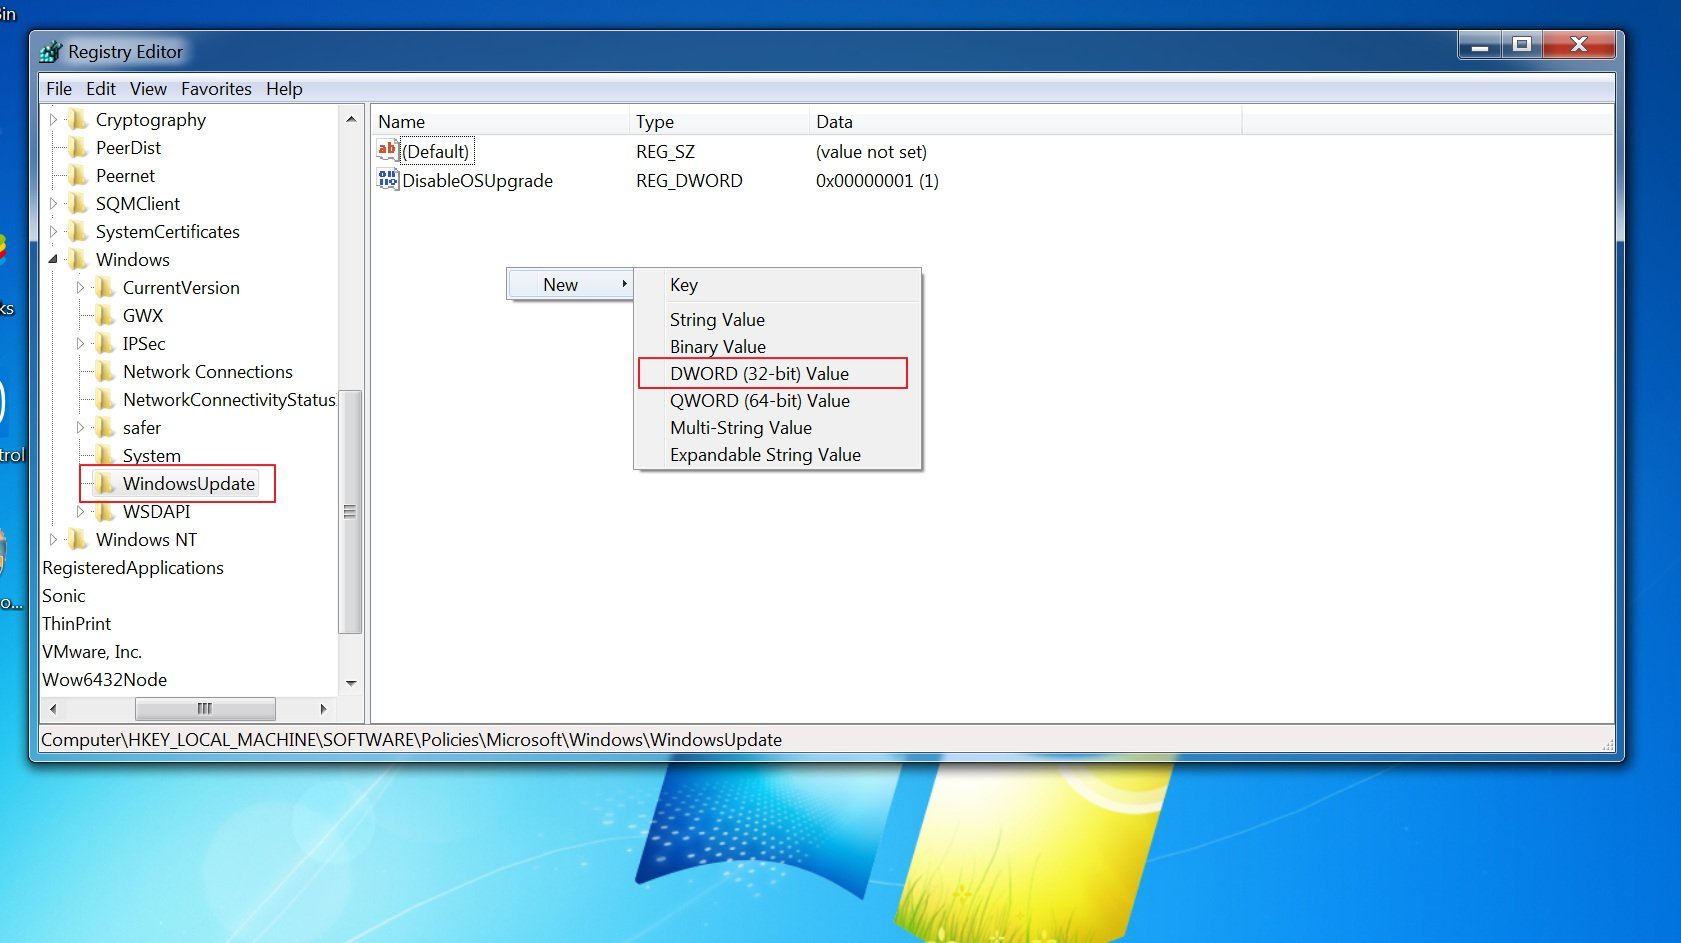 upgrade windows 8 to windows 8.1 manually